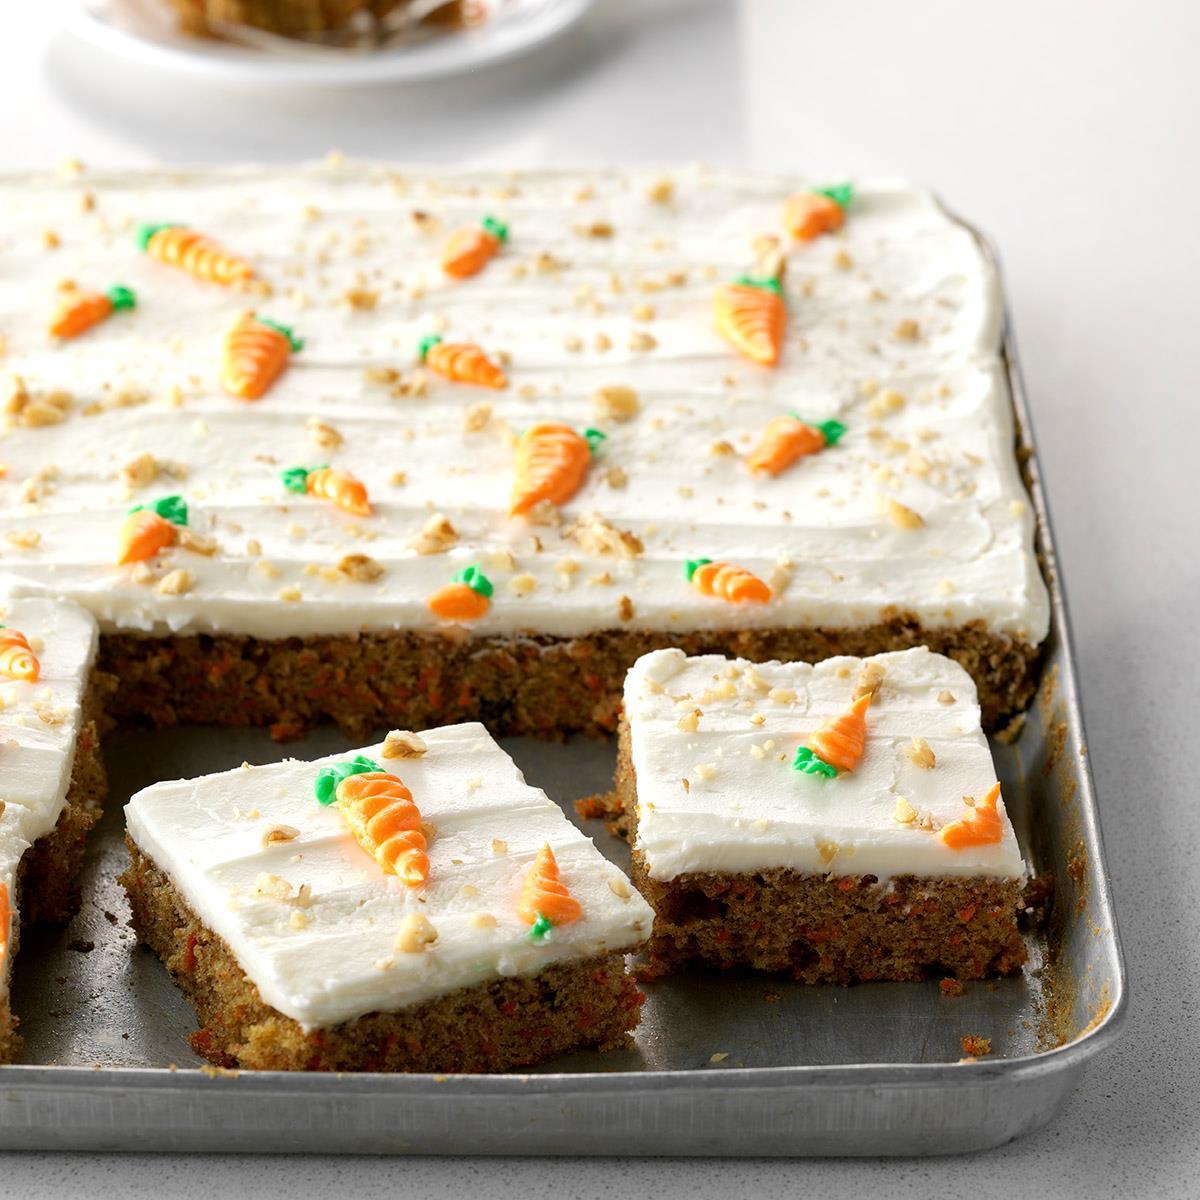 Surprising Carrot Sheet Cake Recipe Taste Of Home Funny Birthday Cards Online Elaedamsfinfo